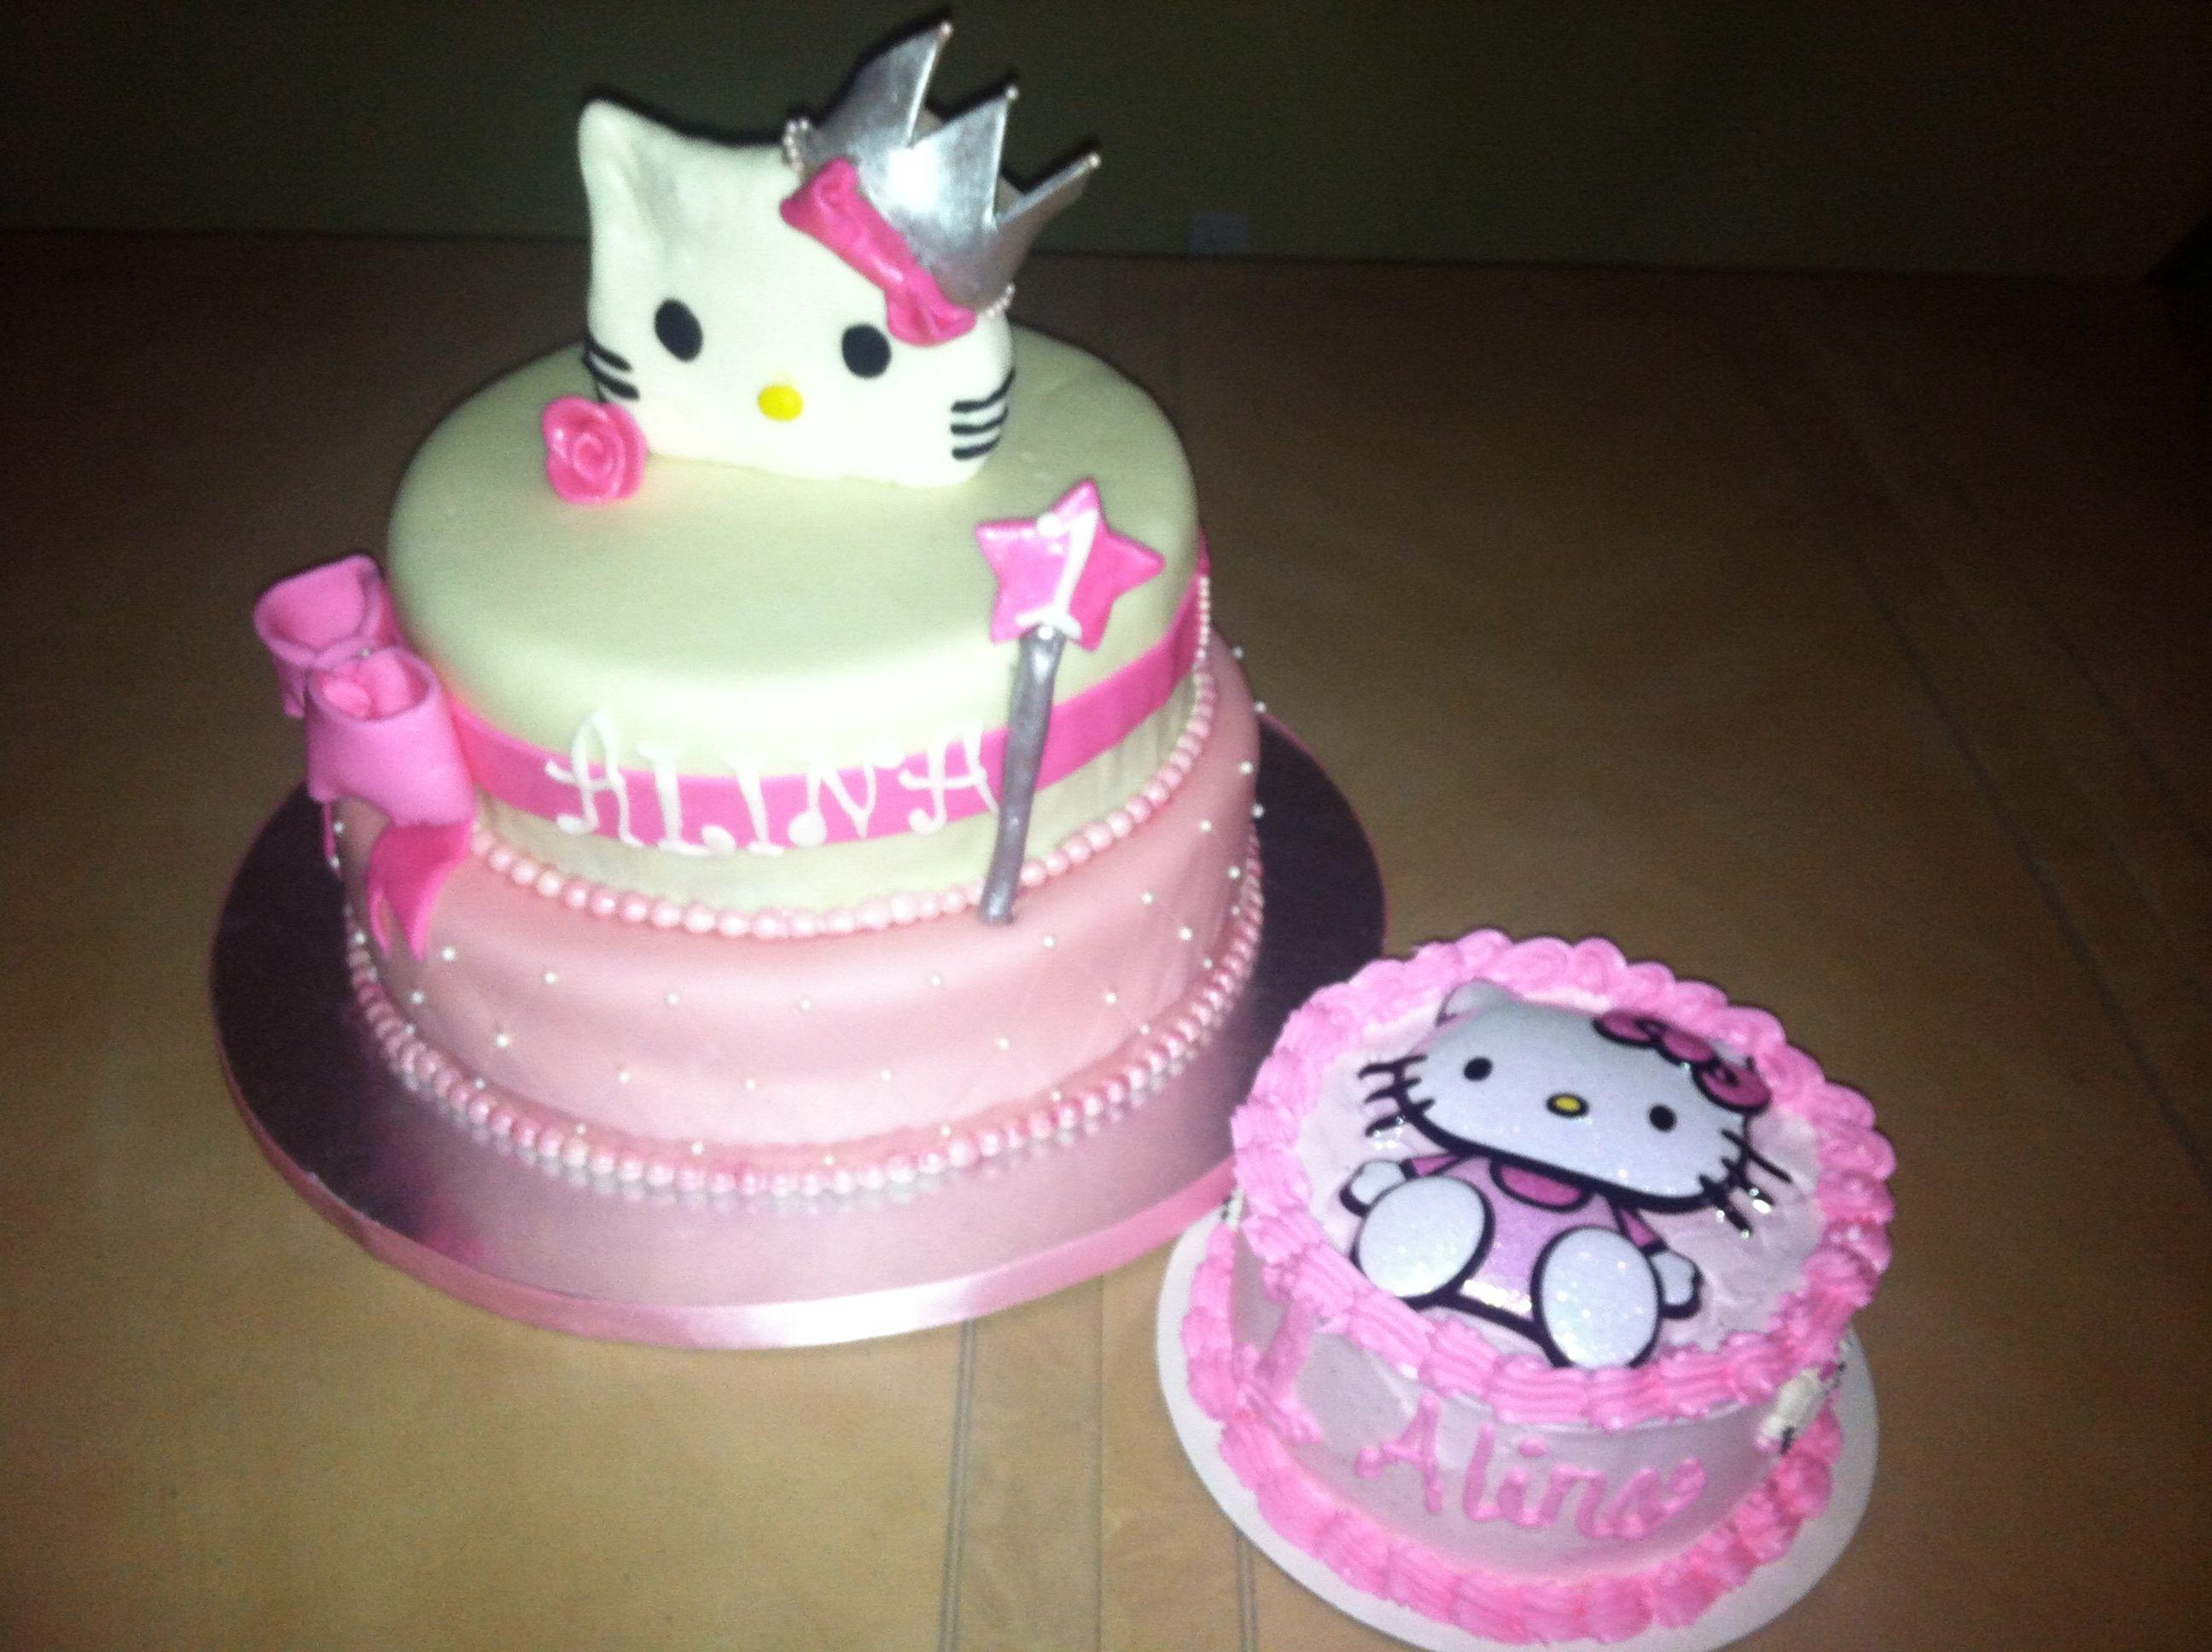 Hello Kitty Princess Cake (With images) | Princess kitty ...